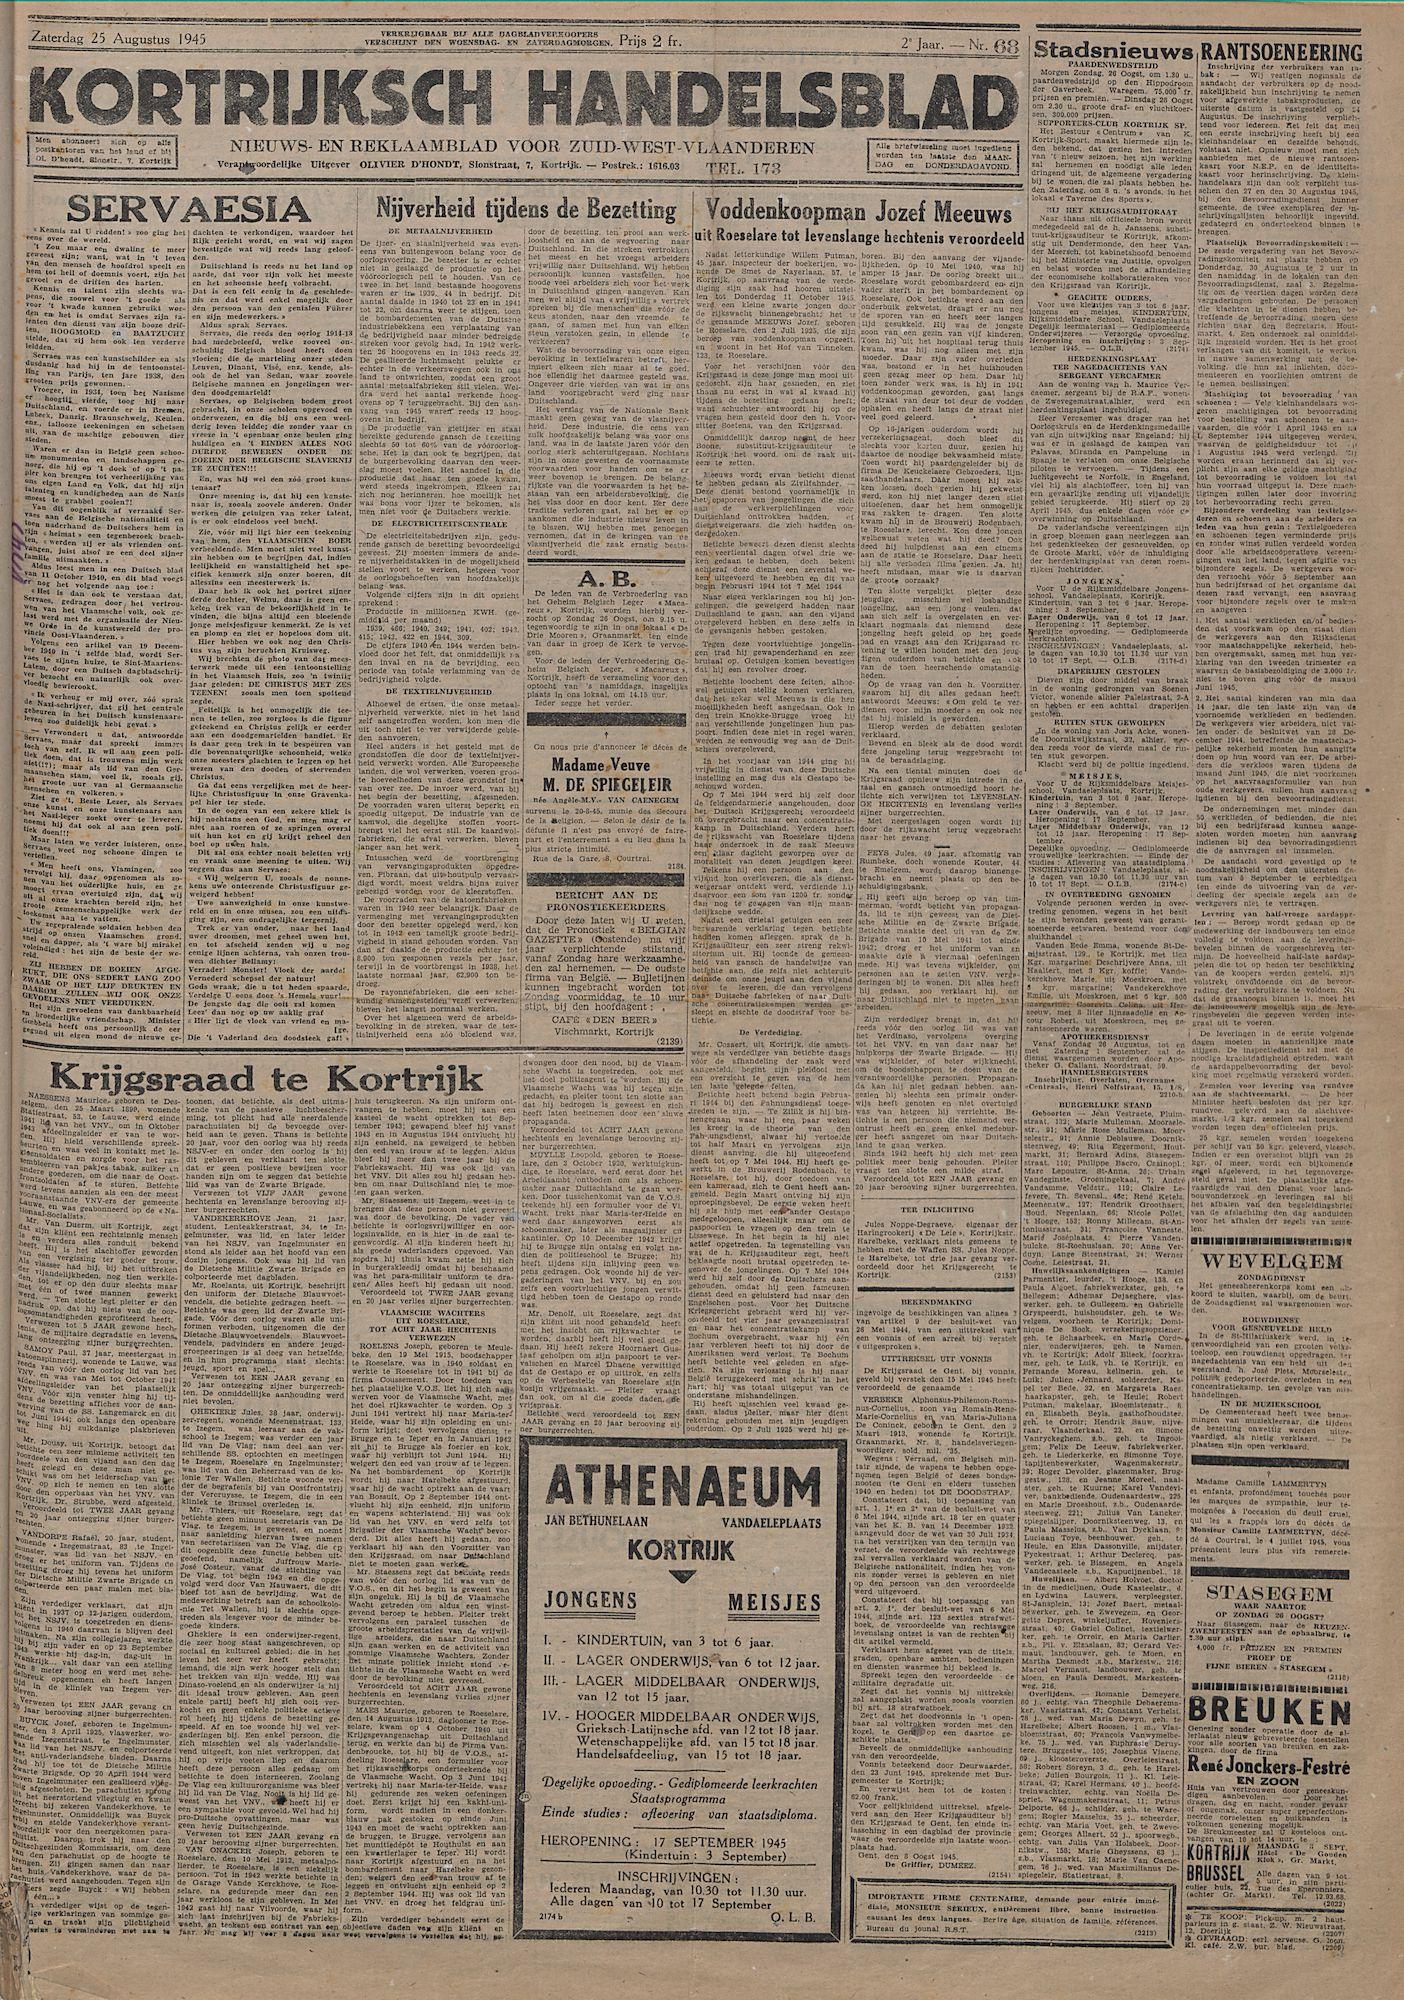 Kortrijksch Handelsblad 25 augustus 1945 Nr68 p1